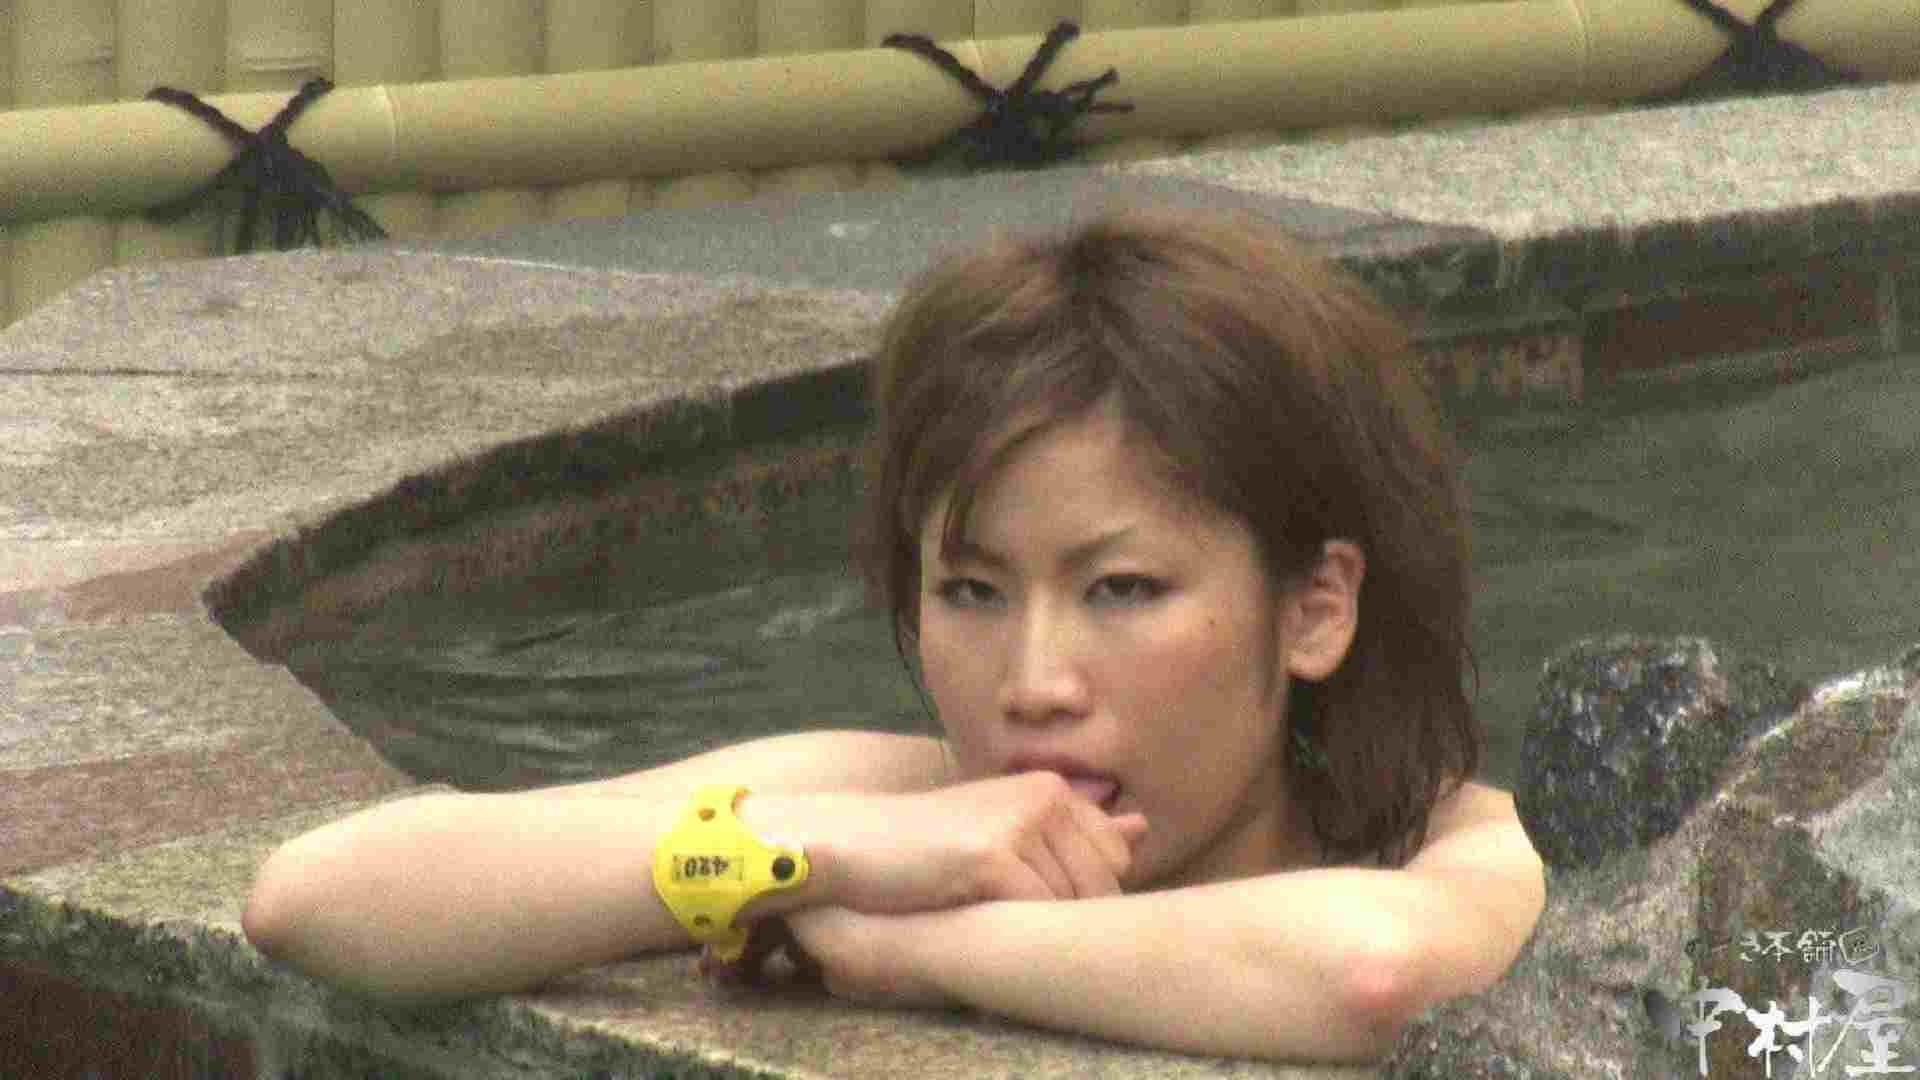 Aquaな露天風呂Vol.918 露天風呂突入 おまんこ無修正動画無料 75pic 17